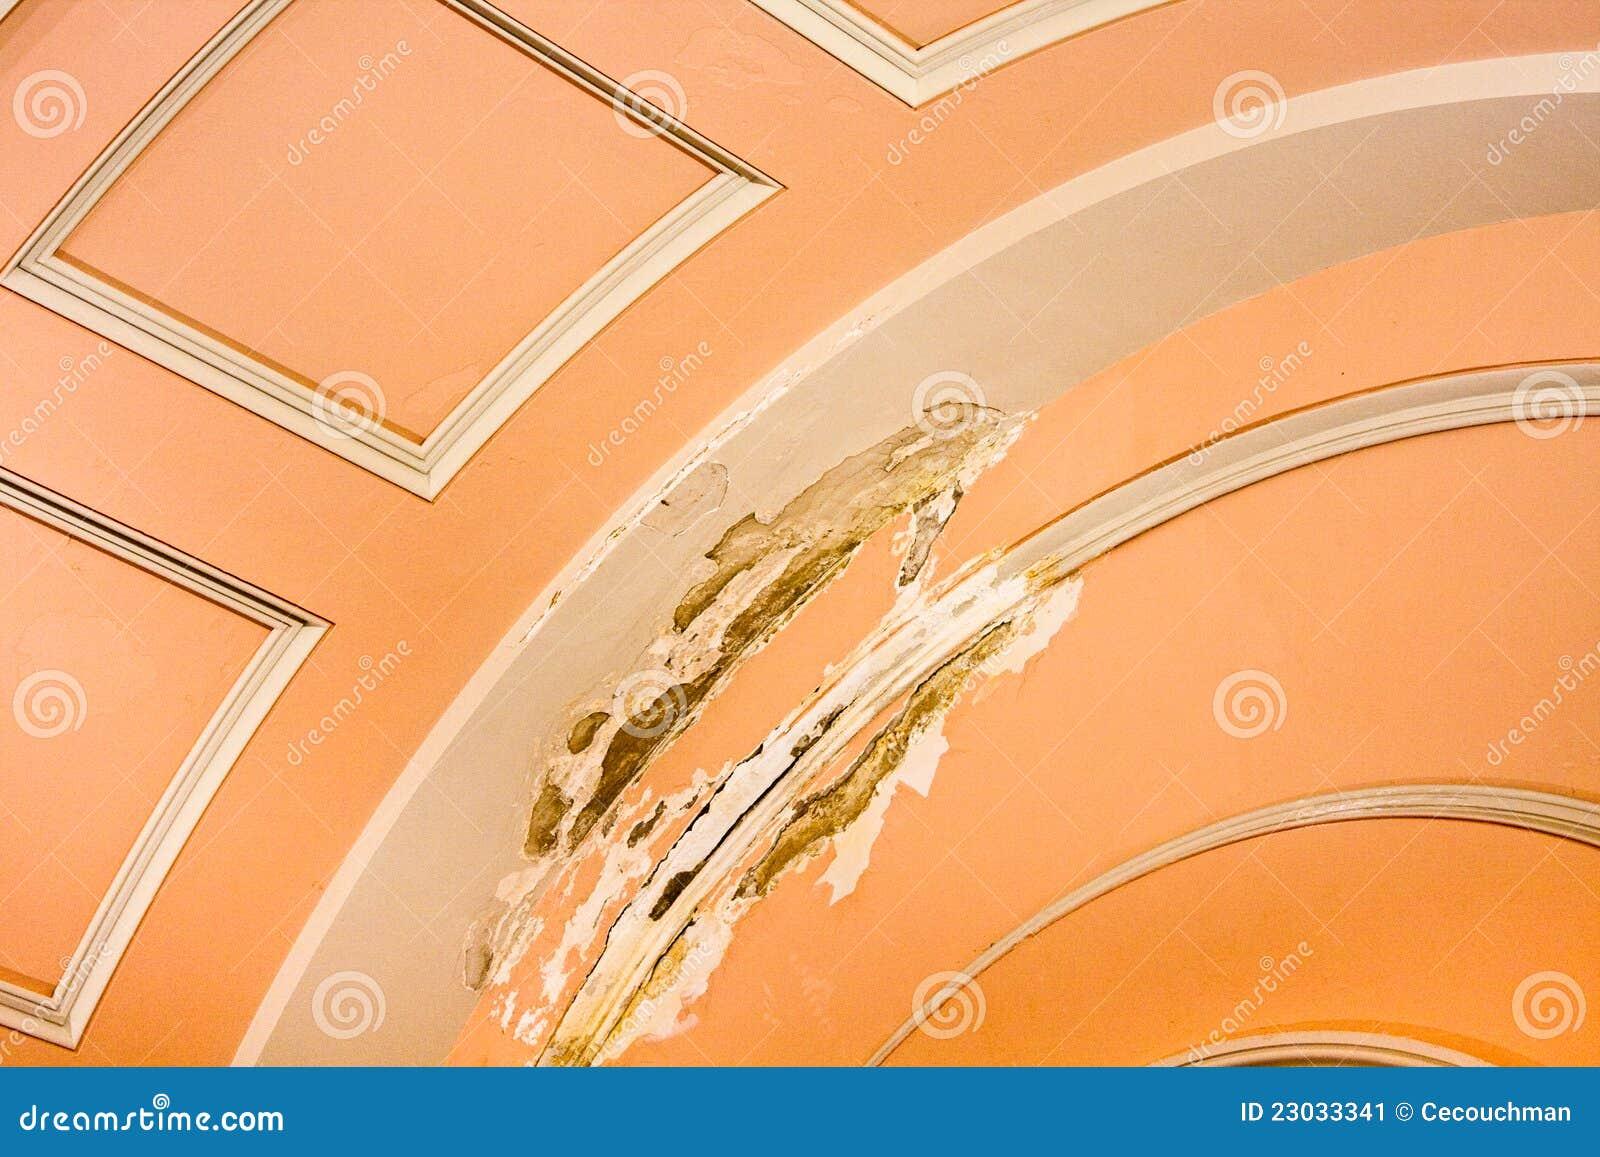 interior paint peeling stock image image 23033341. Black Bedroom Furniture Sets. Home Design Ideas